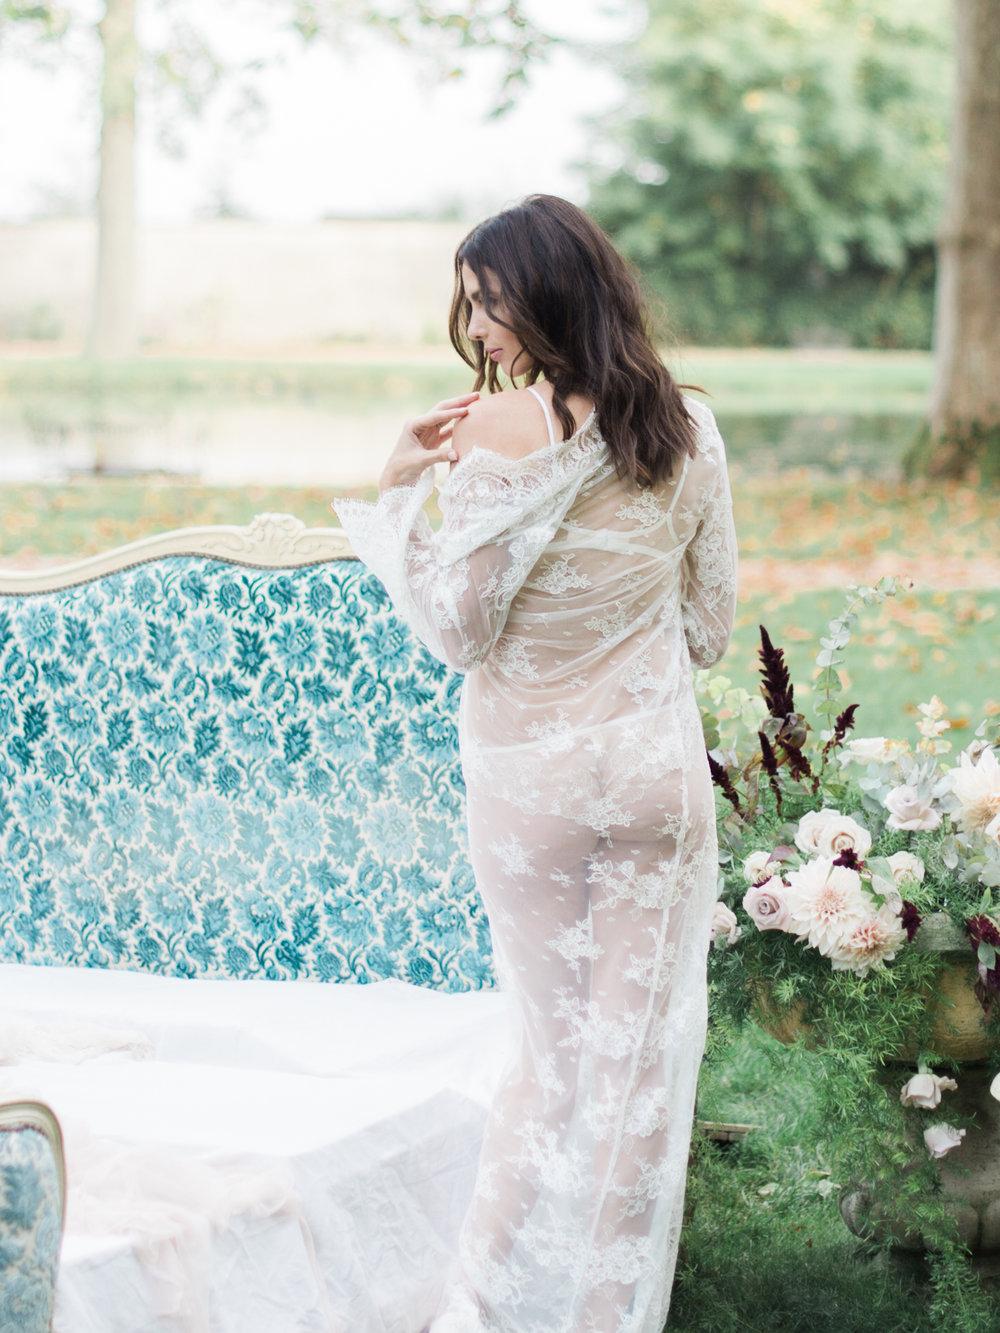 JacquelineAnnePhotography-Boudoir-Outdoors-16.jpg